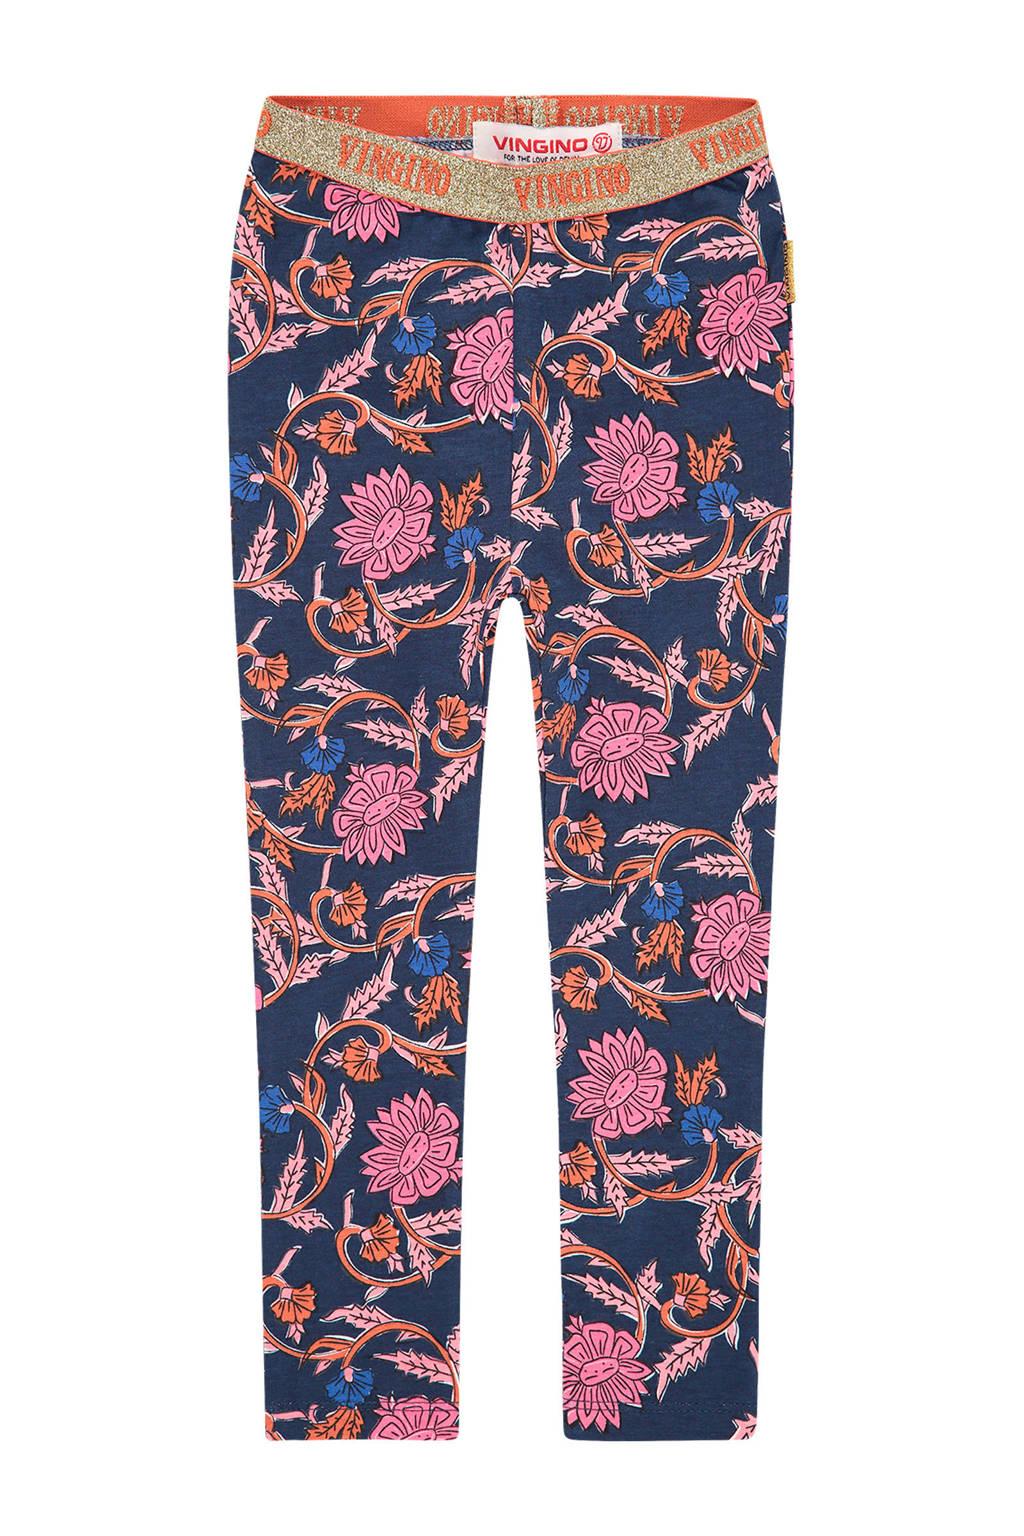 Vingino regular fit legging Stella mini met all over print donkerblauw/roze, Donkerblauw/roze